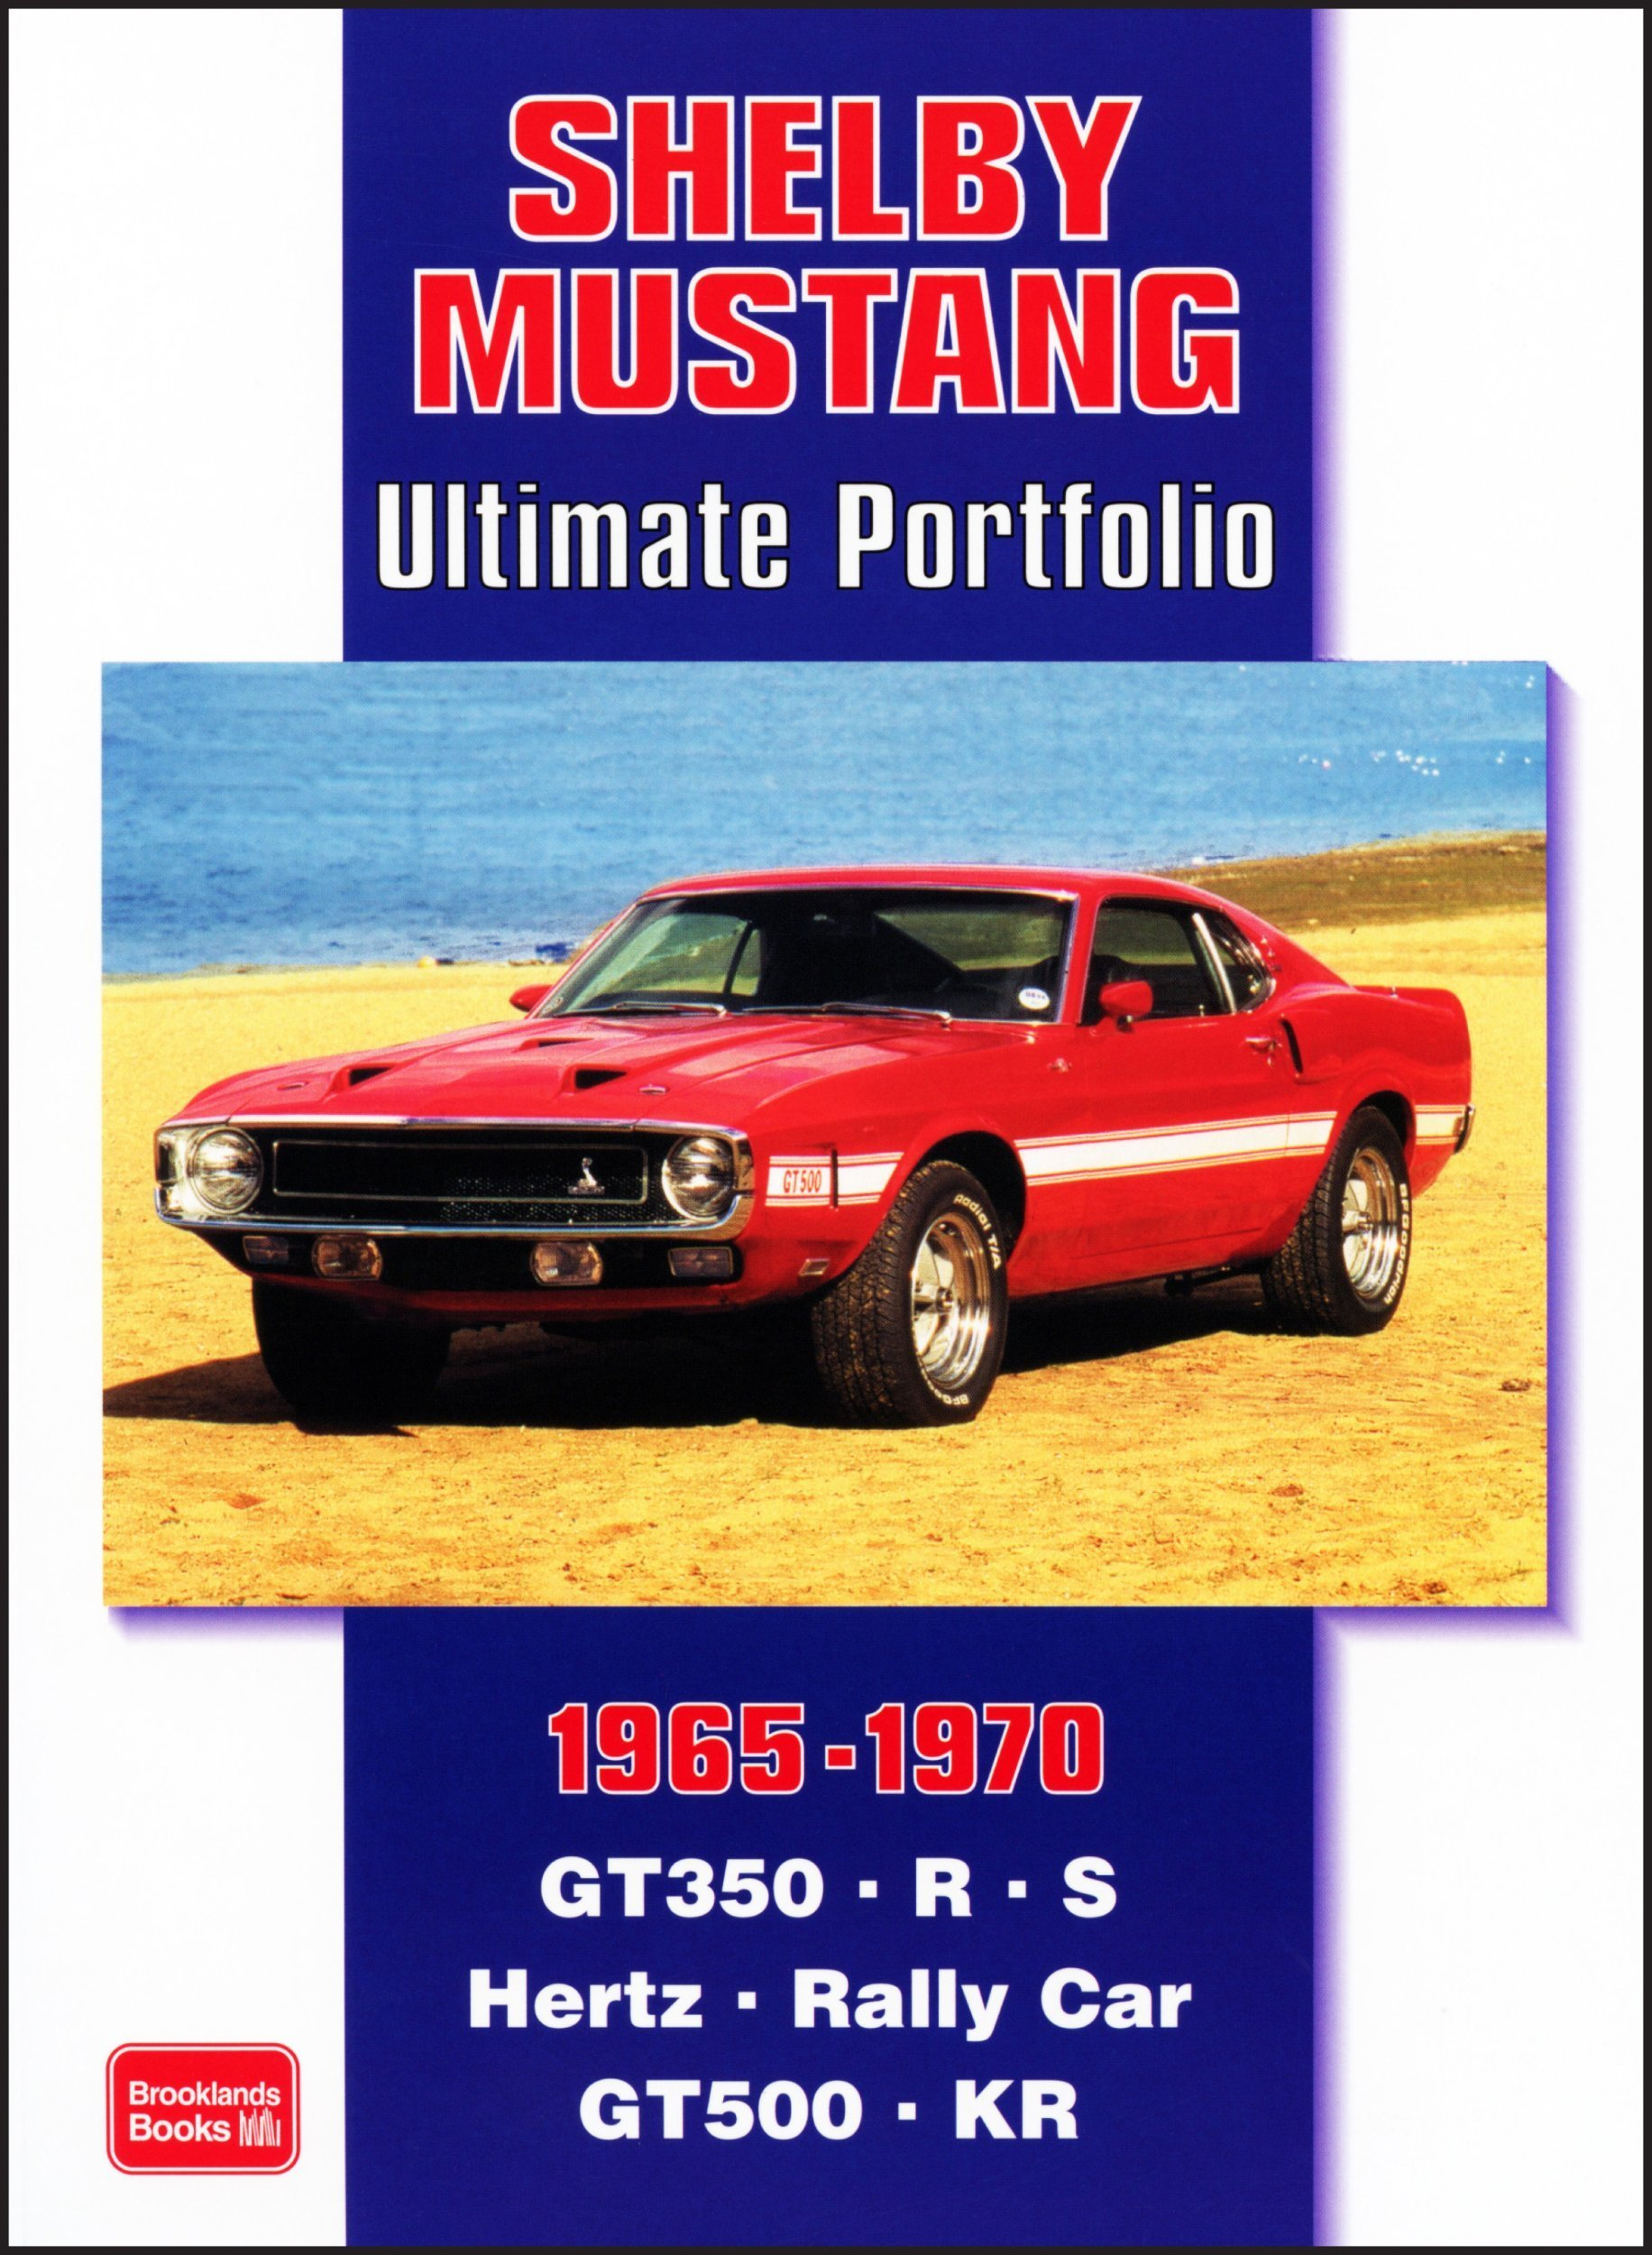 Shelby Mustang 1965-1970: Ultimate Portfolio: R.M. Clarke: 9781855206335:  Amazon.com: Books